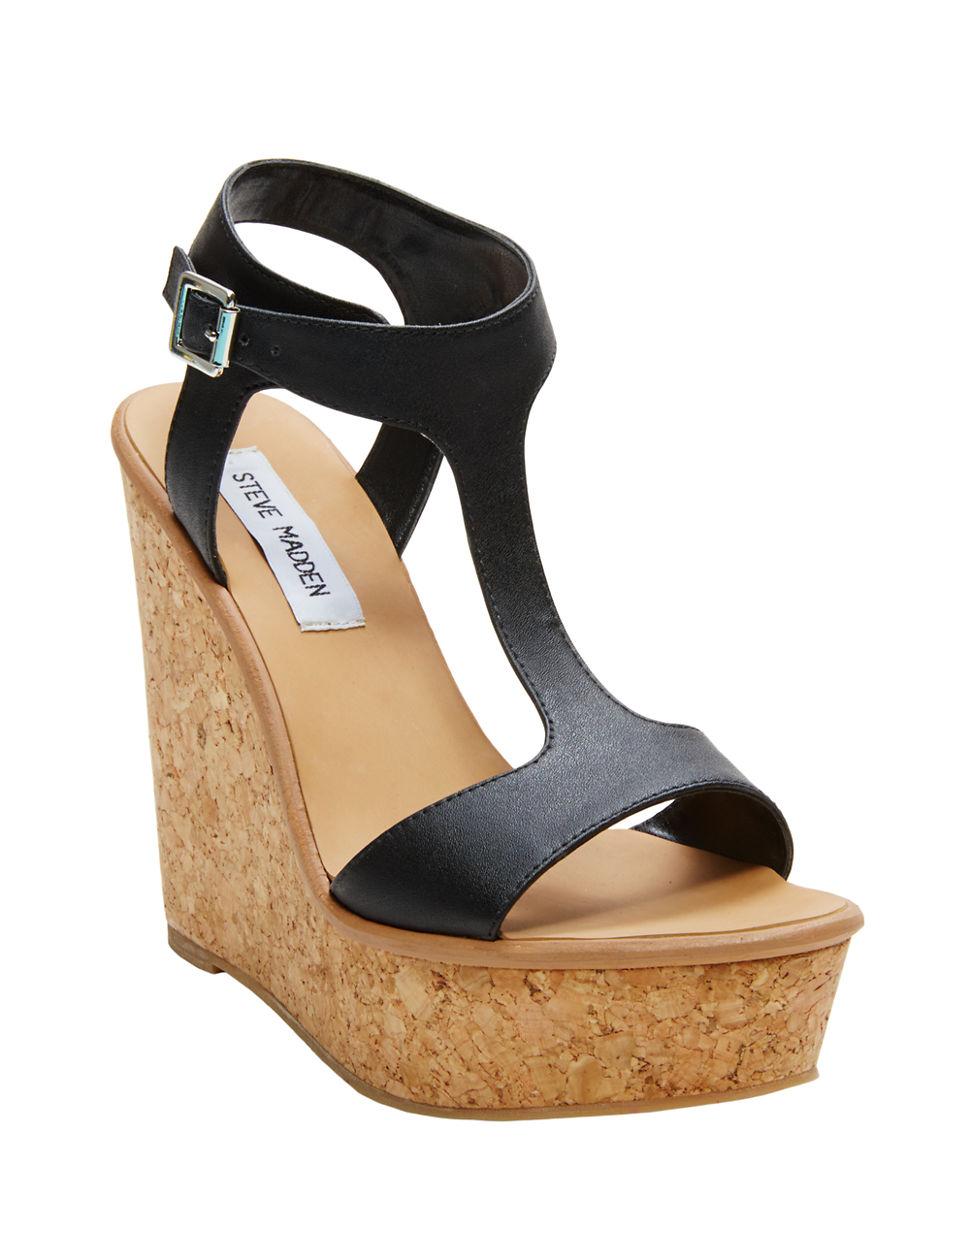 753b84292313 Lyst - Steve Madden Iluvit Wedge Sandals in Black